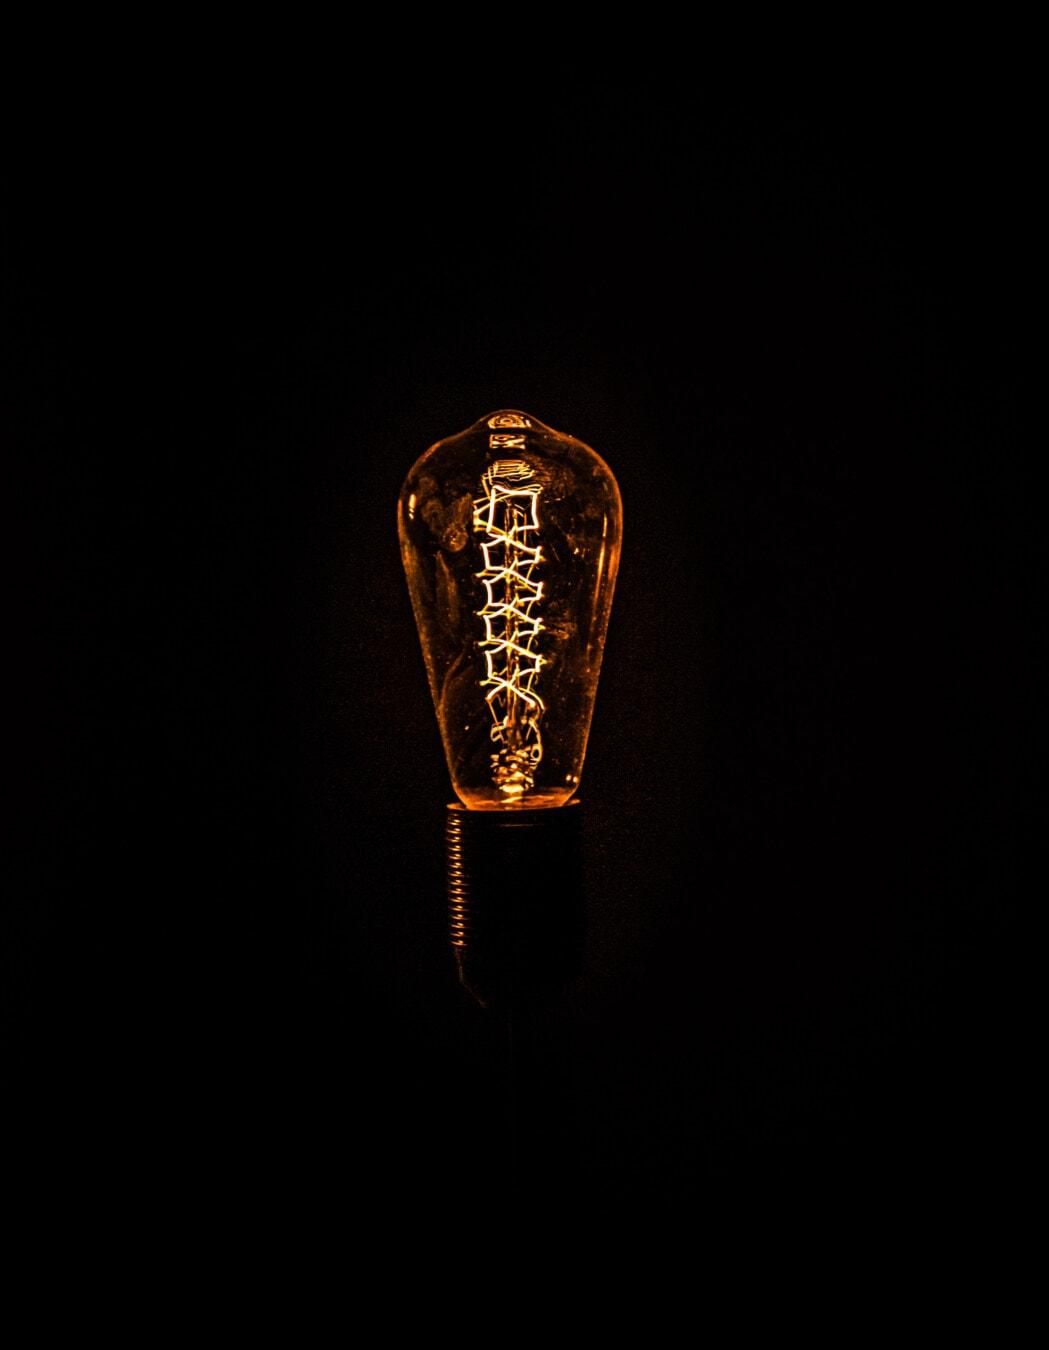 черно, фон, електрическа крушка, проводници, нажежаема жичка, реколта, изобретение, детайли, енергия, Тел